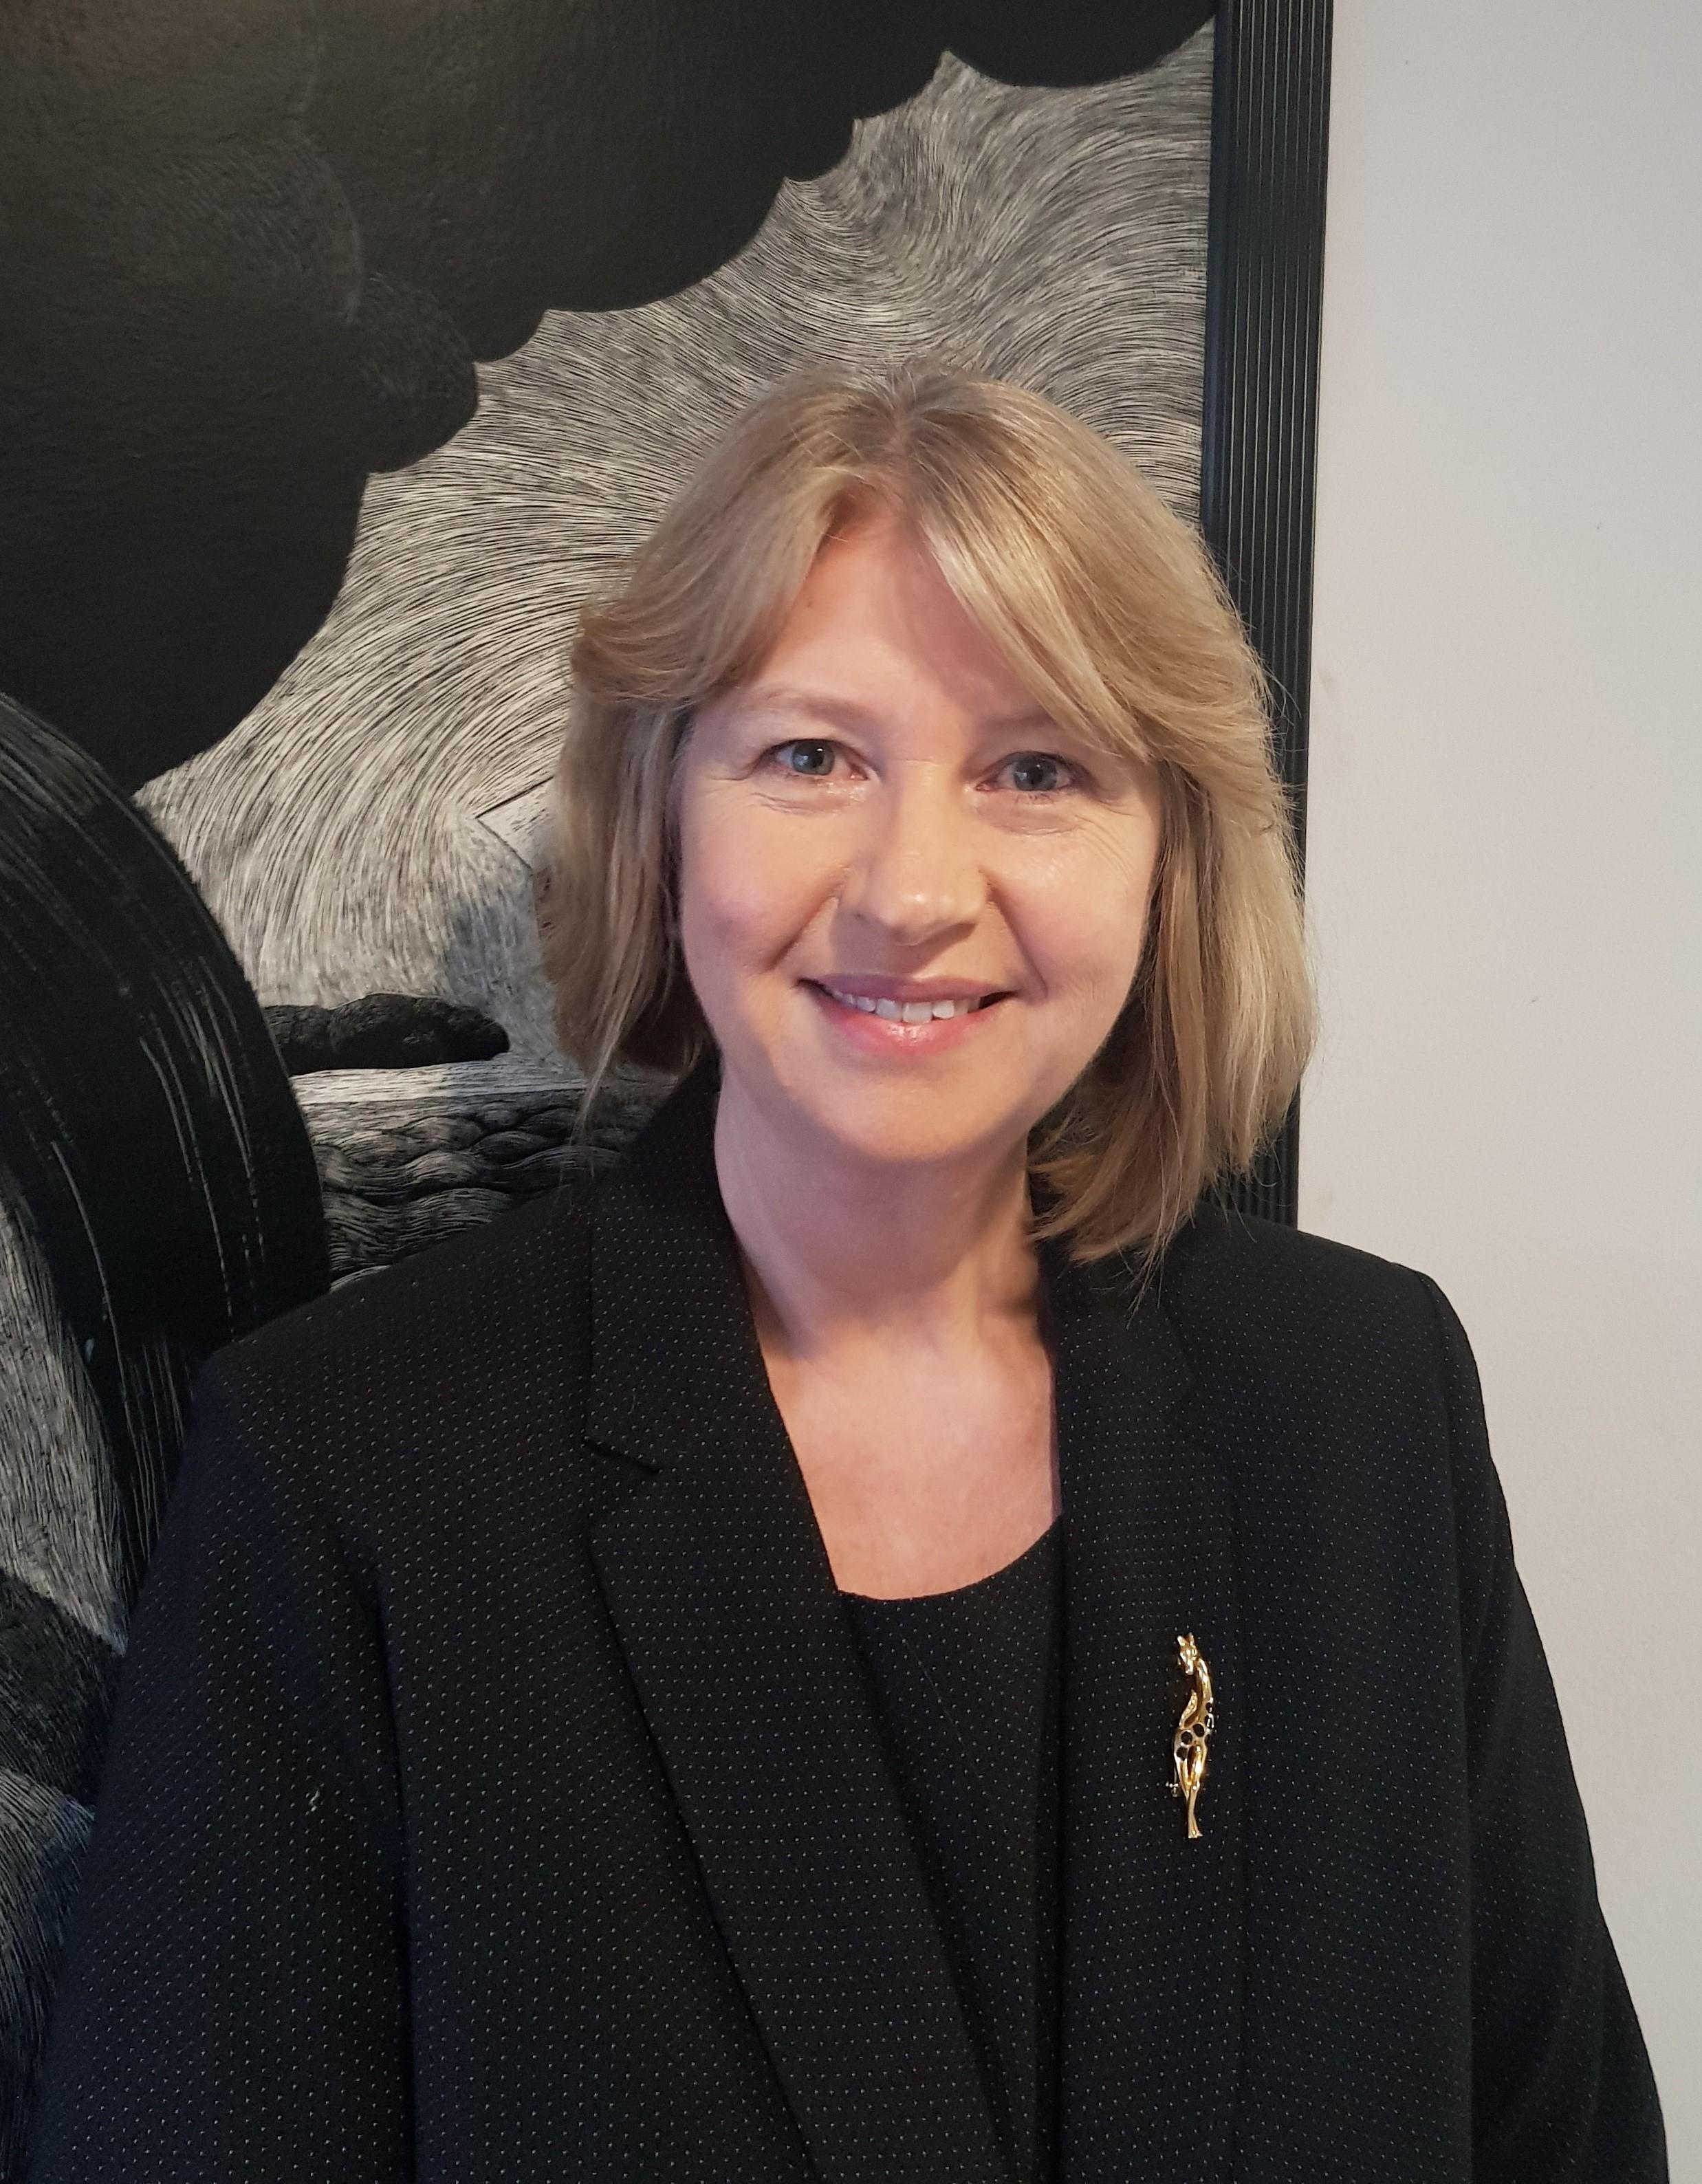 Ann Skelton